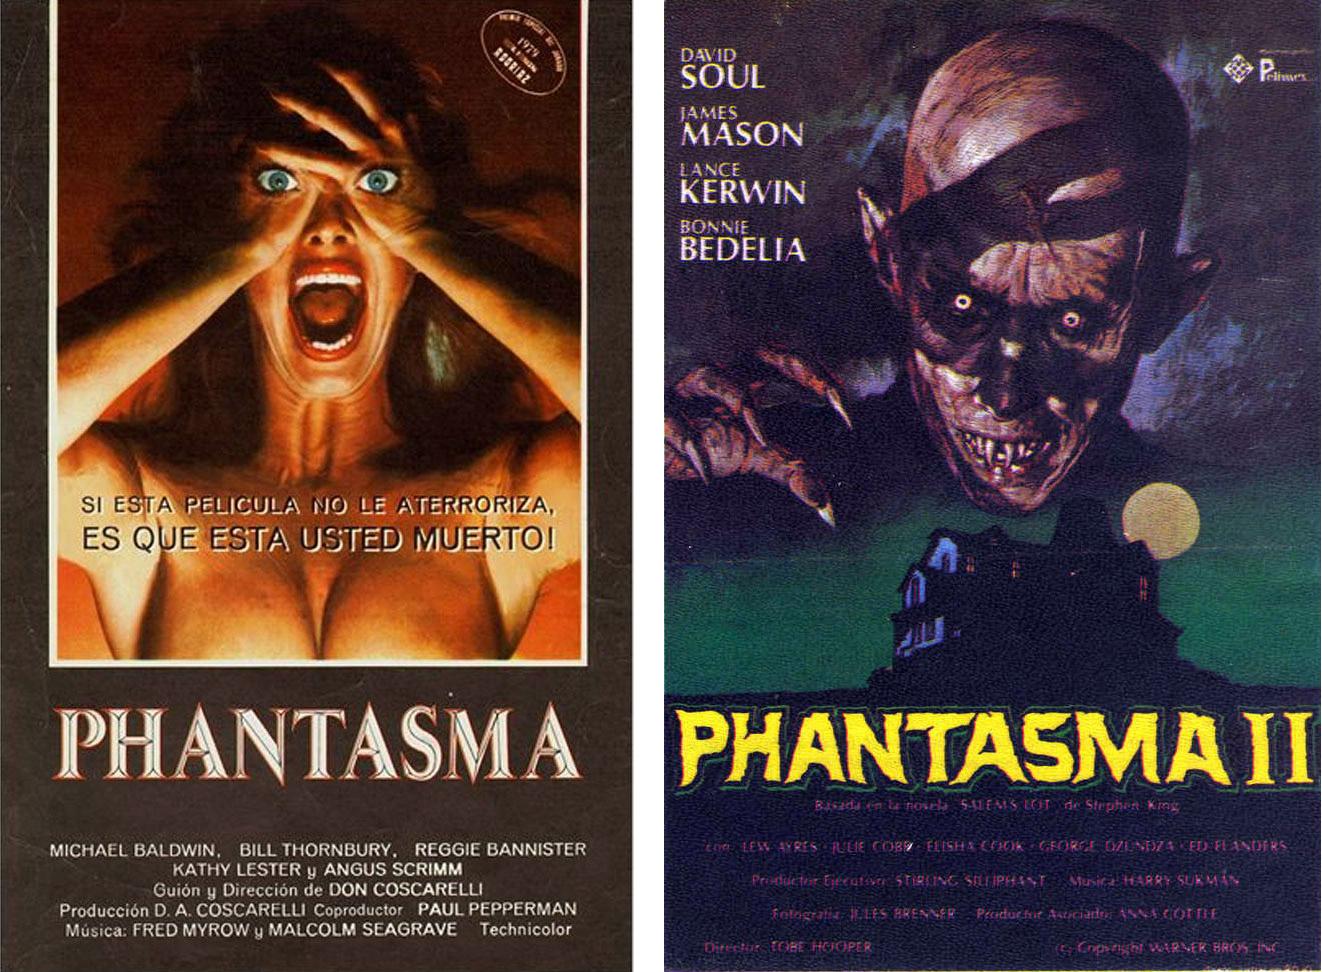 En España se estrenó una falsa secuela de 'Phantasma', la película de Tobe Hooper 'Salem´s lot: The movie'. | Imágenes: New Breed Productions y Warner.